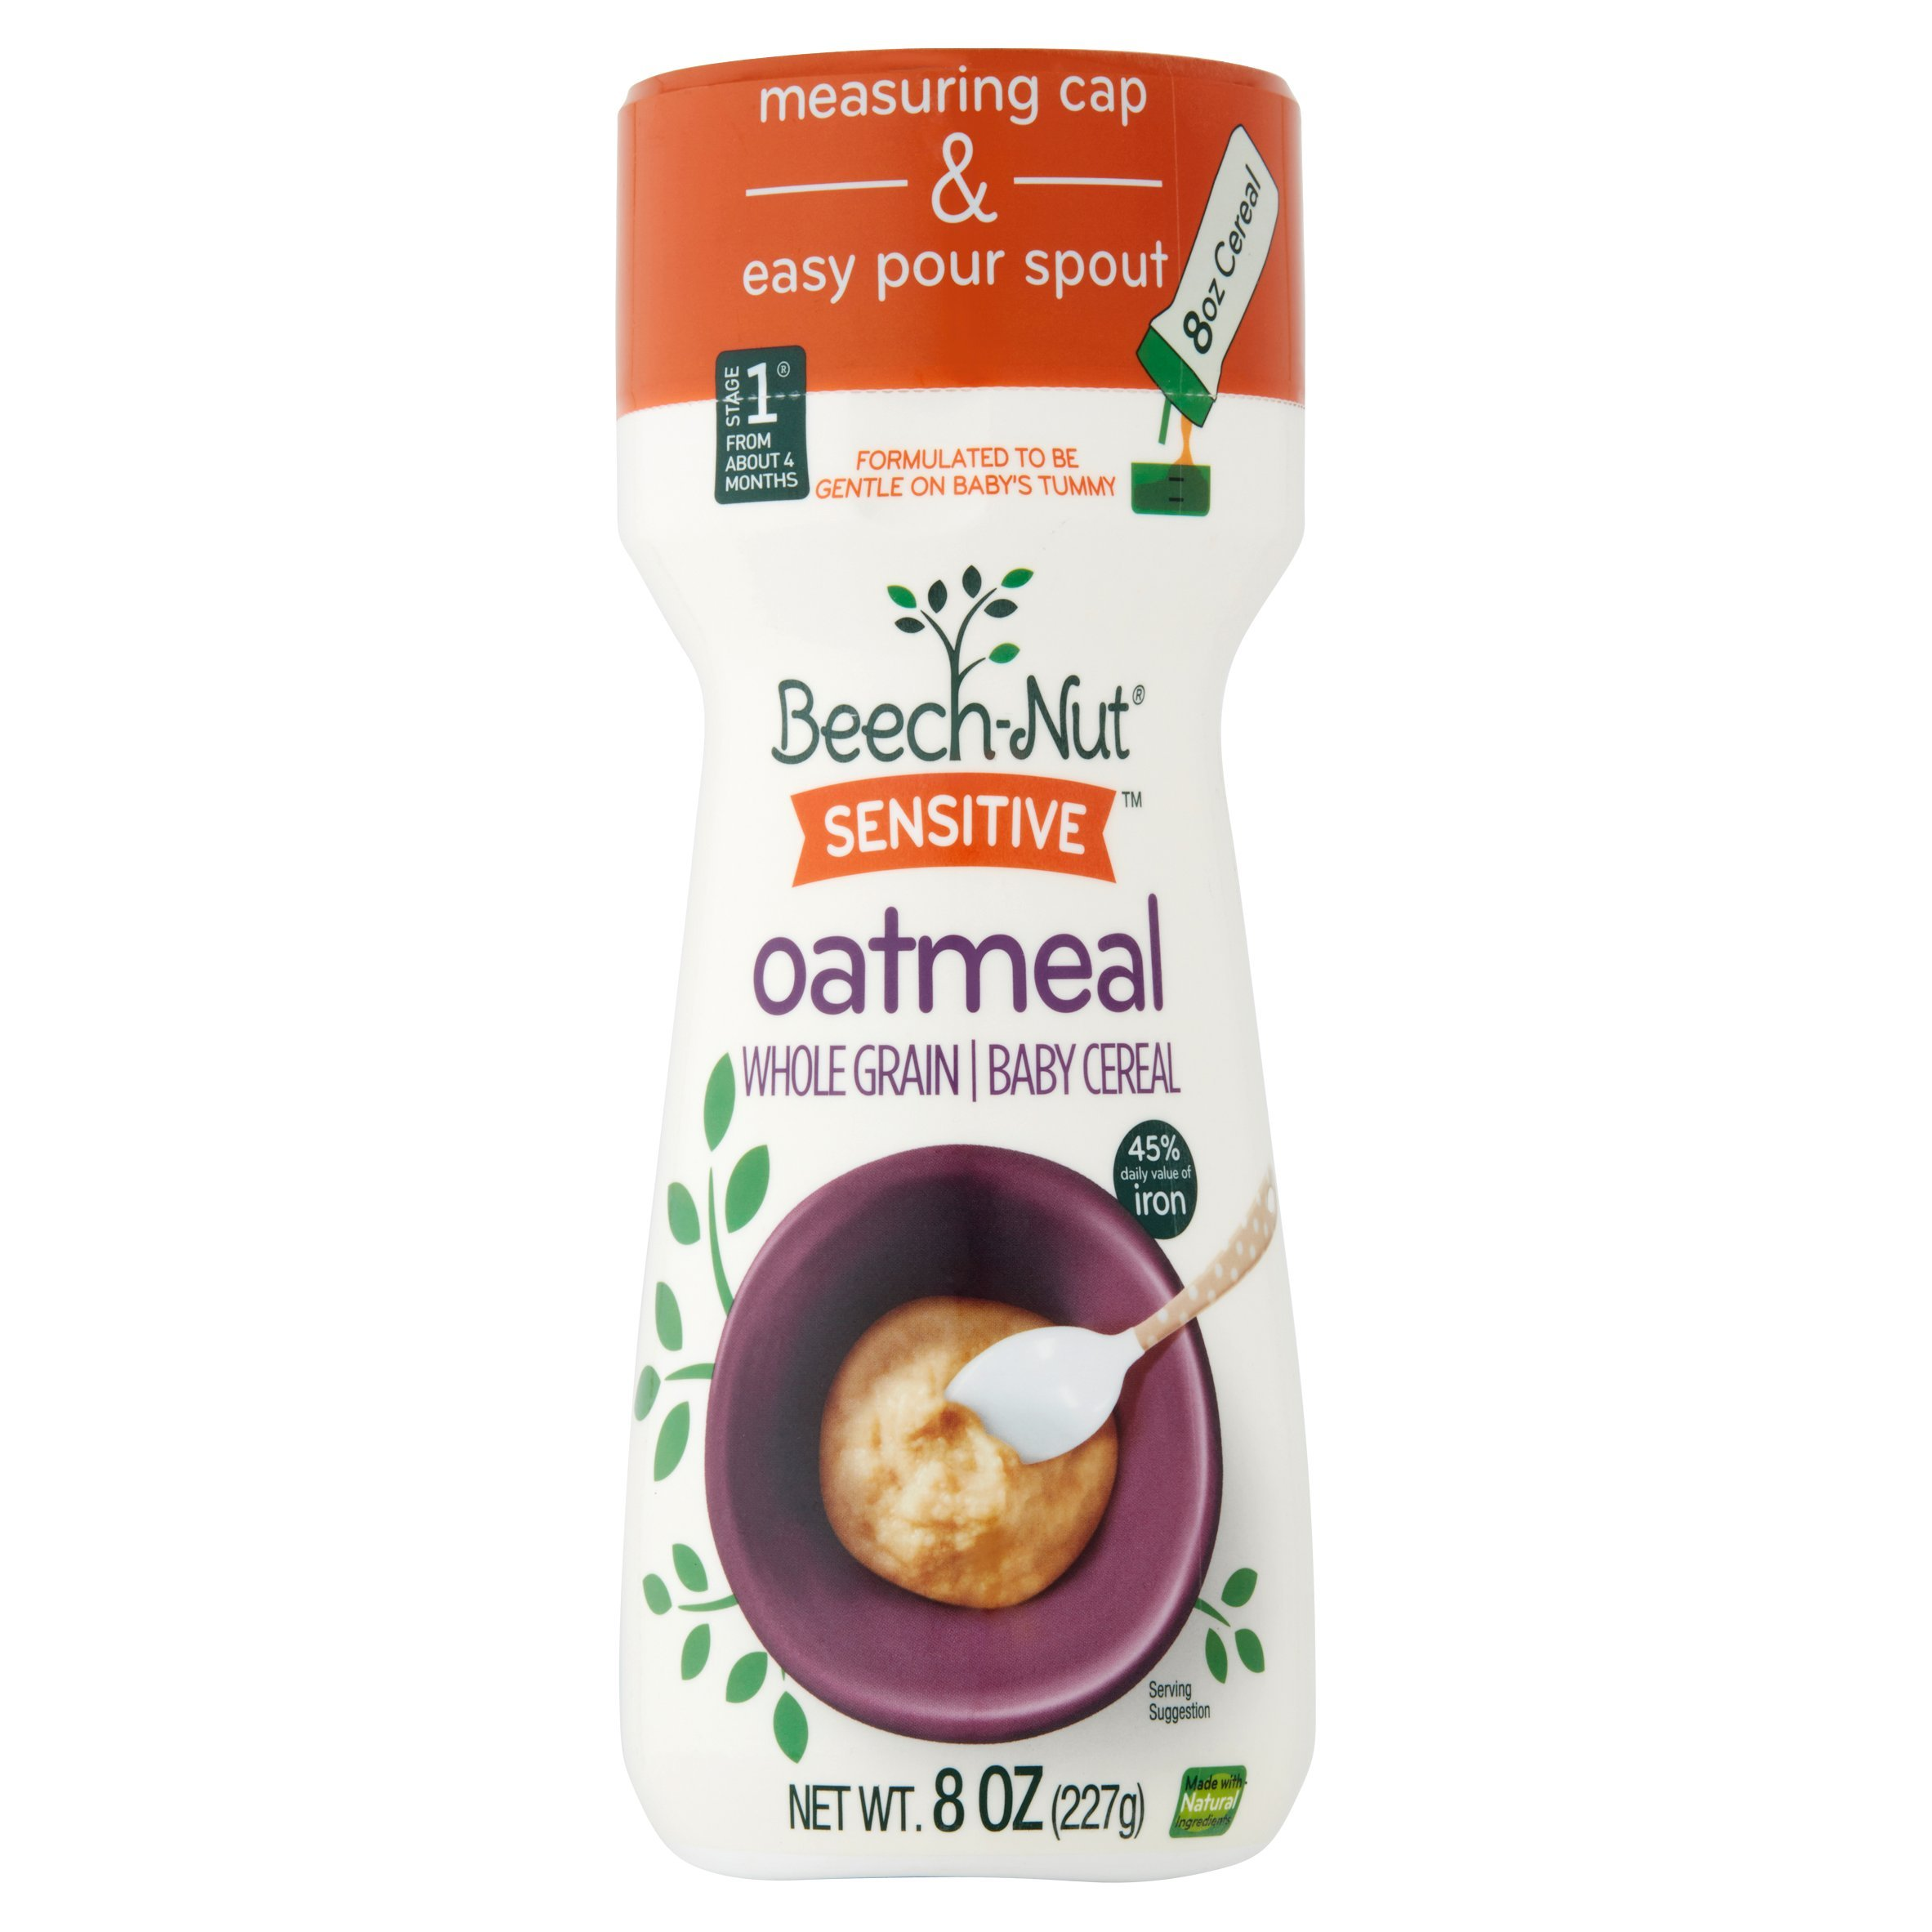 Beech-Nut Complete Oatmeal Sensitive